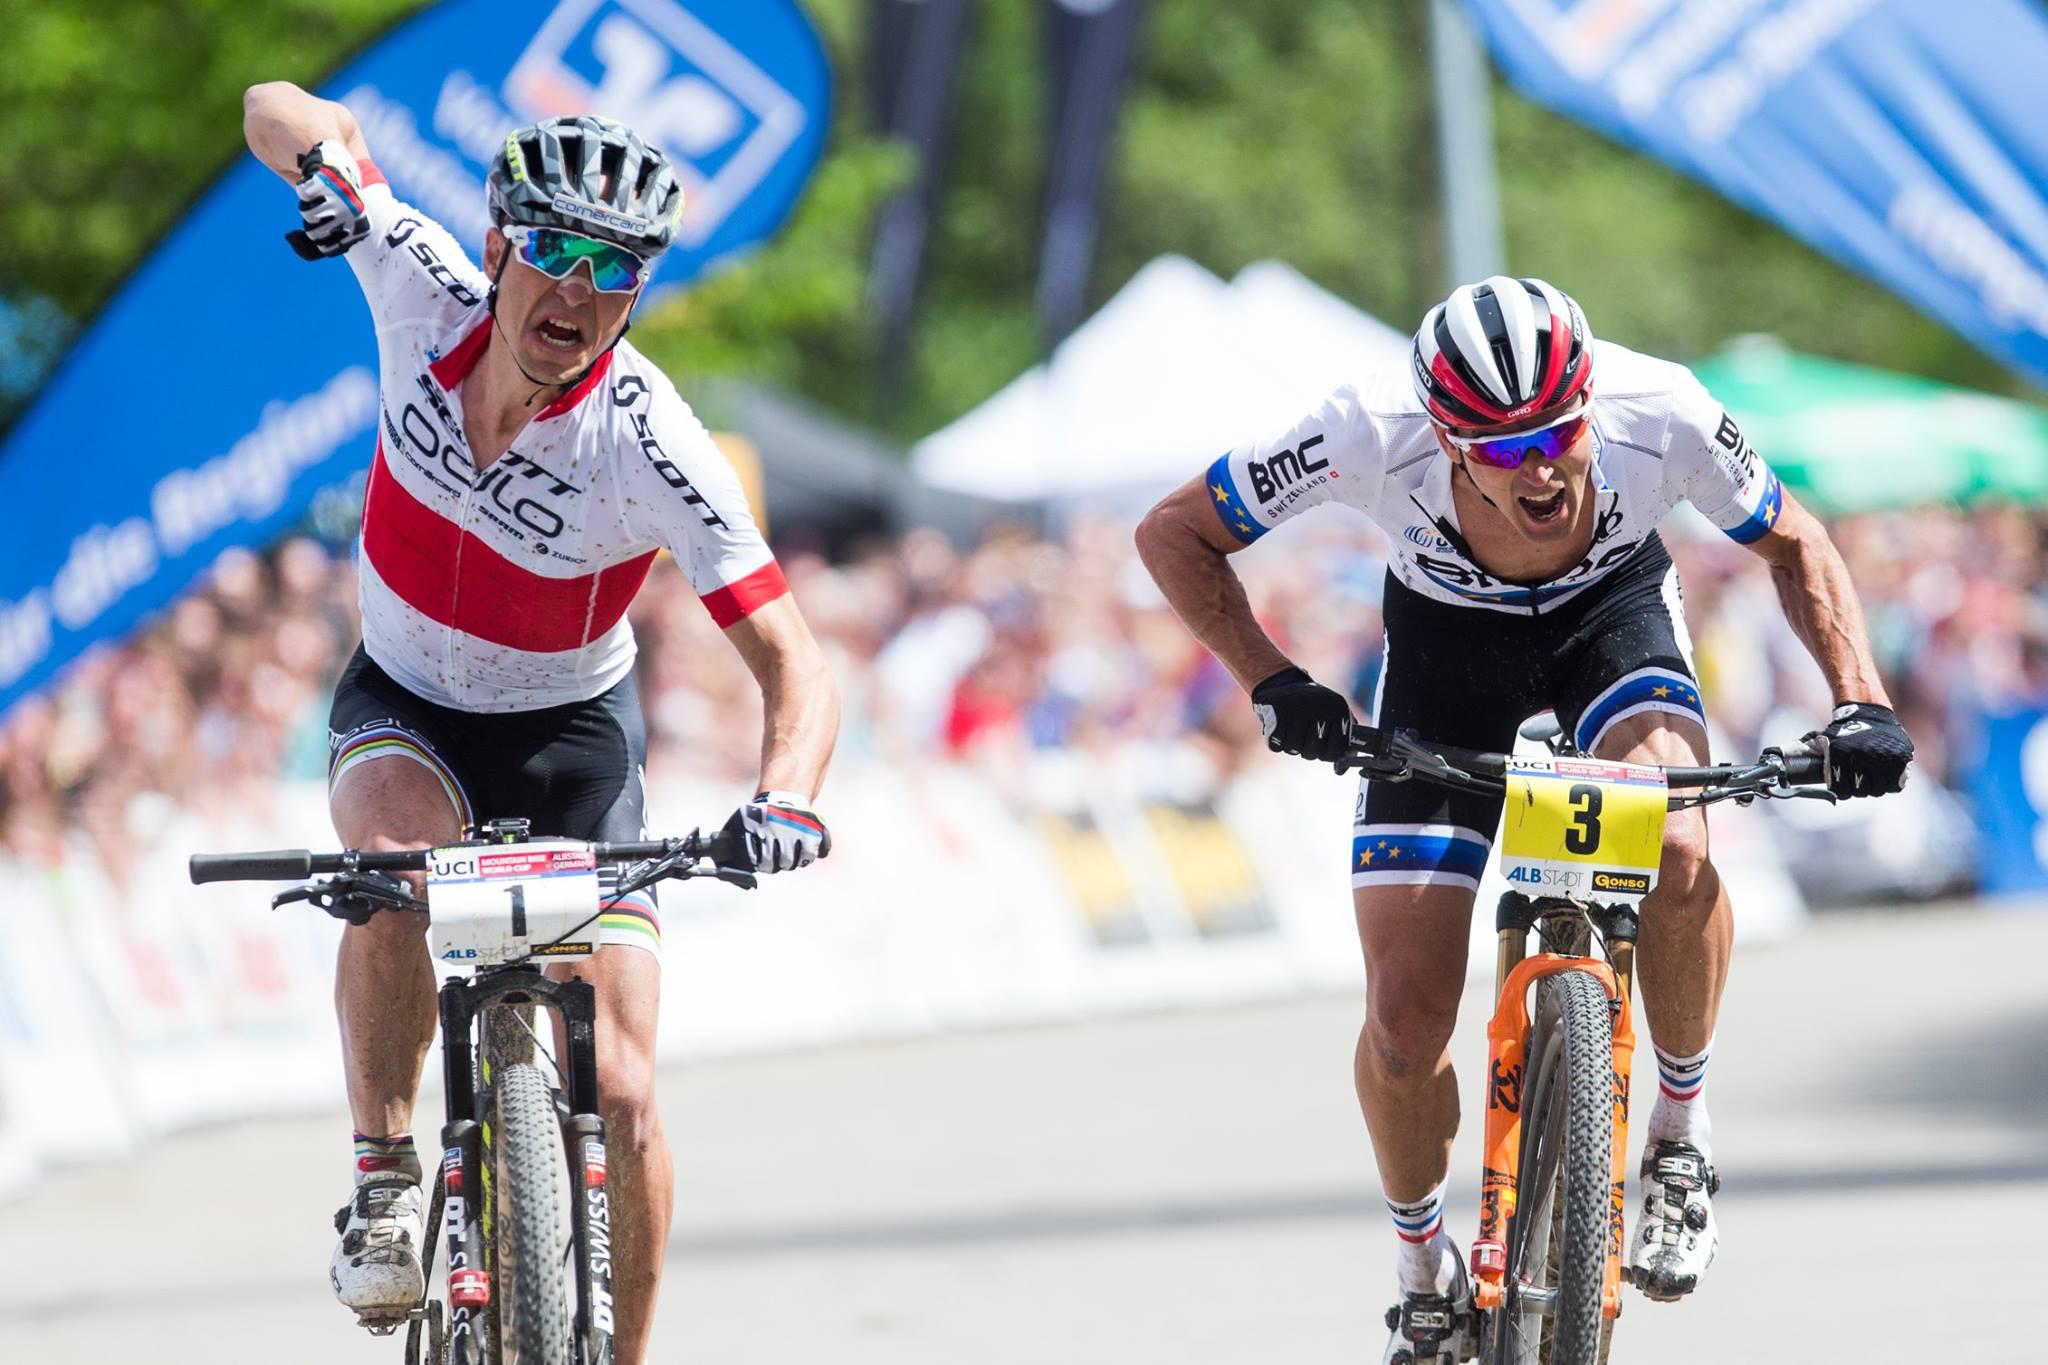 Nino Schurter castiga sprintul in fata lui Julien Absalon